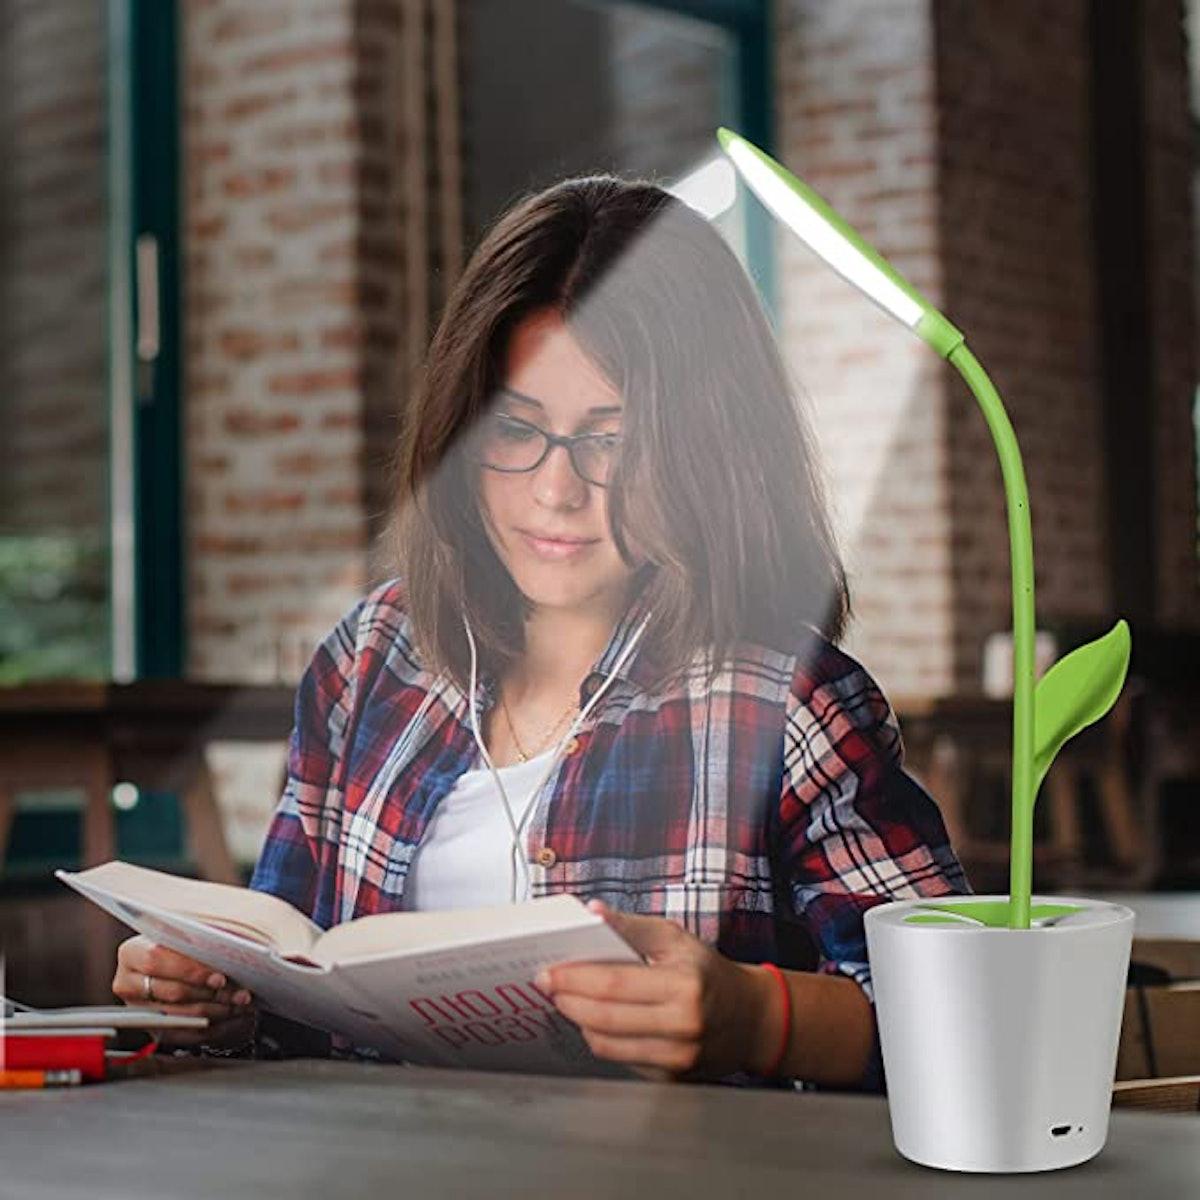 iEGrow Flexible USB LED Desk Lamp